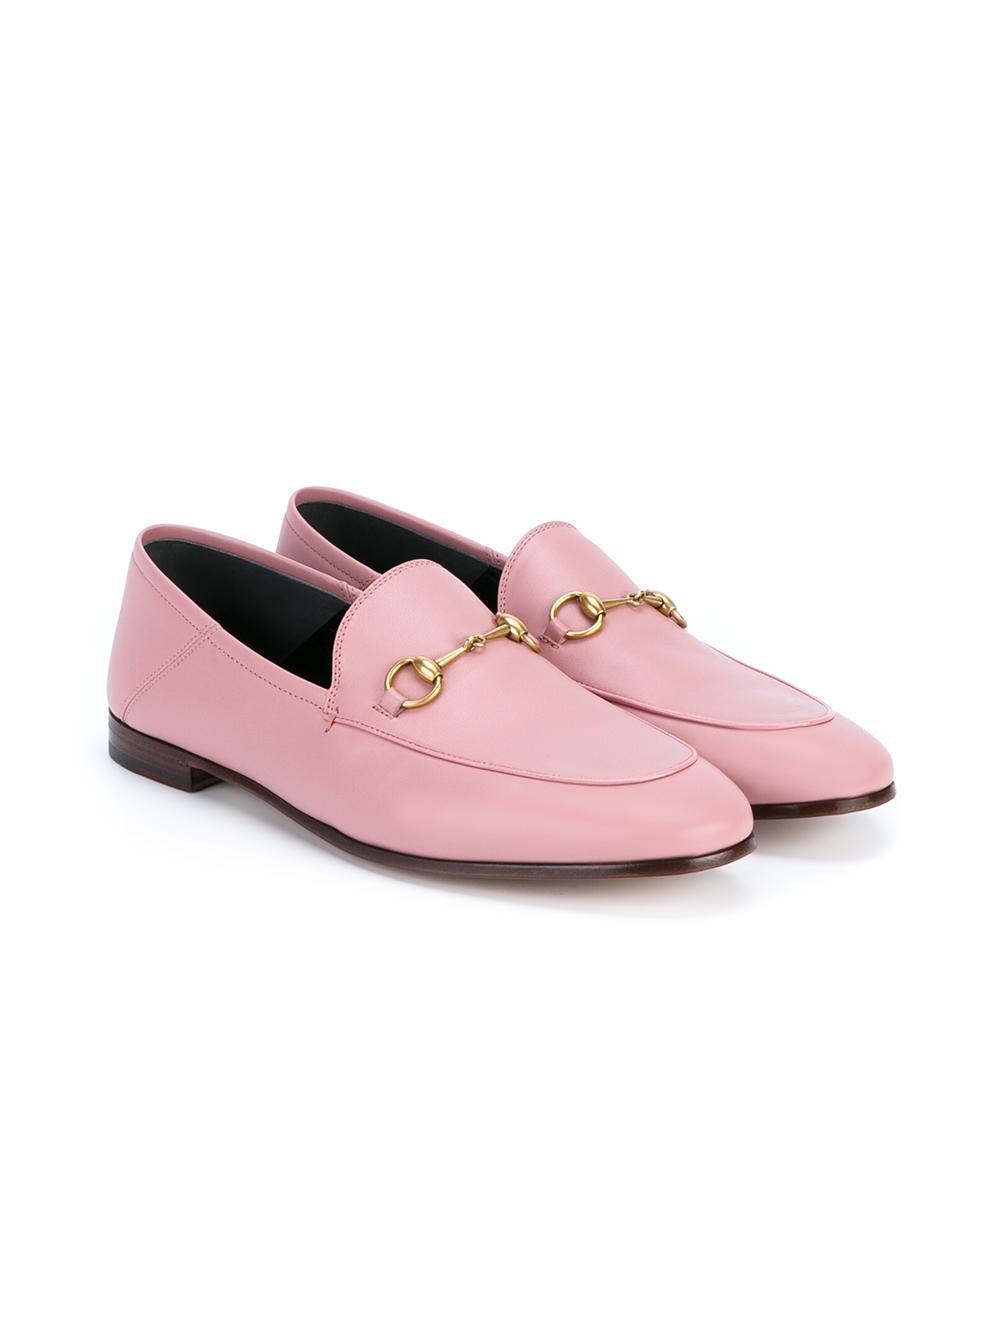 33931d2e882 Gucci Jordaan Horsebit Loafers in Pink - Lyst